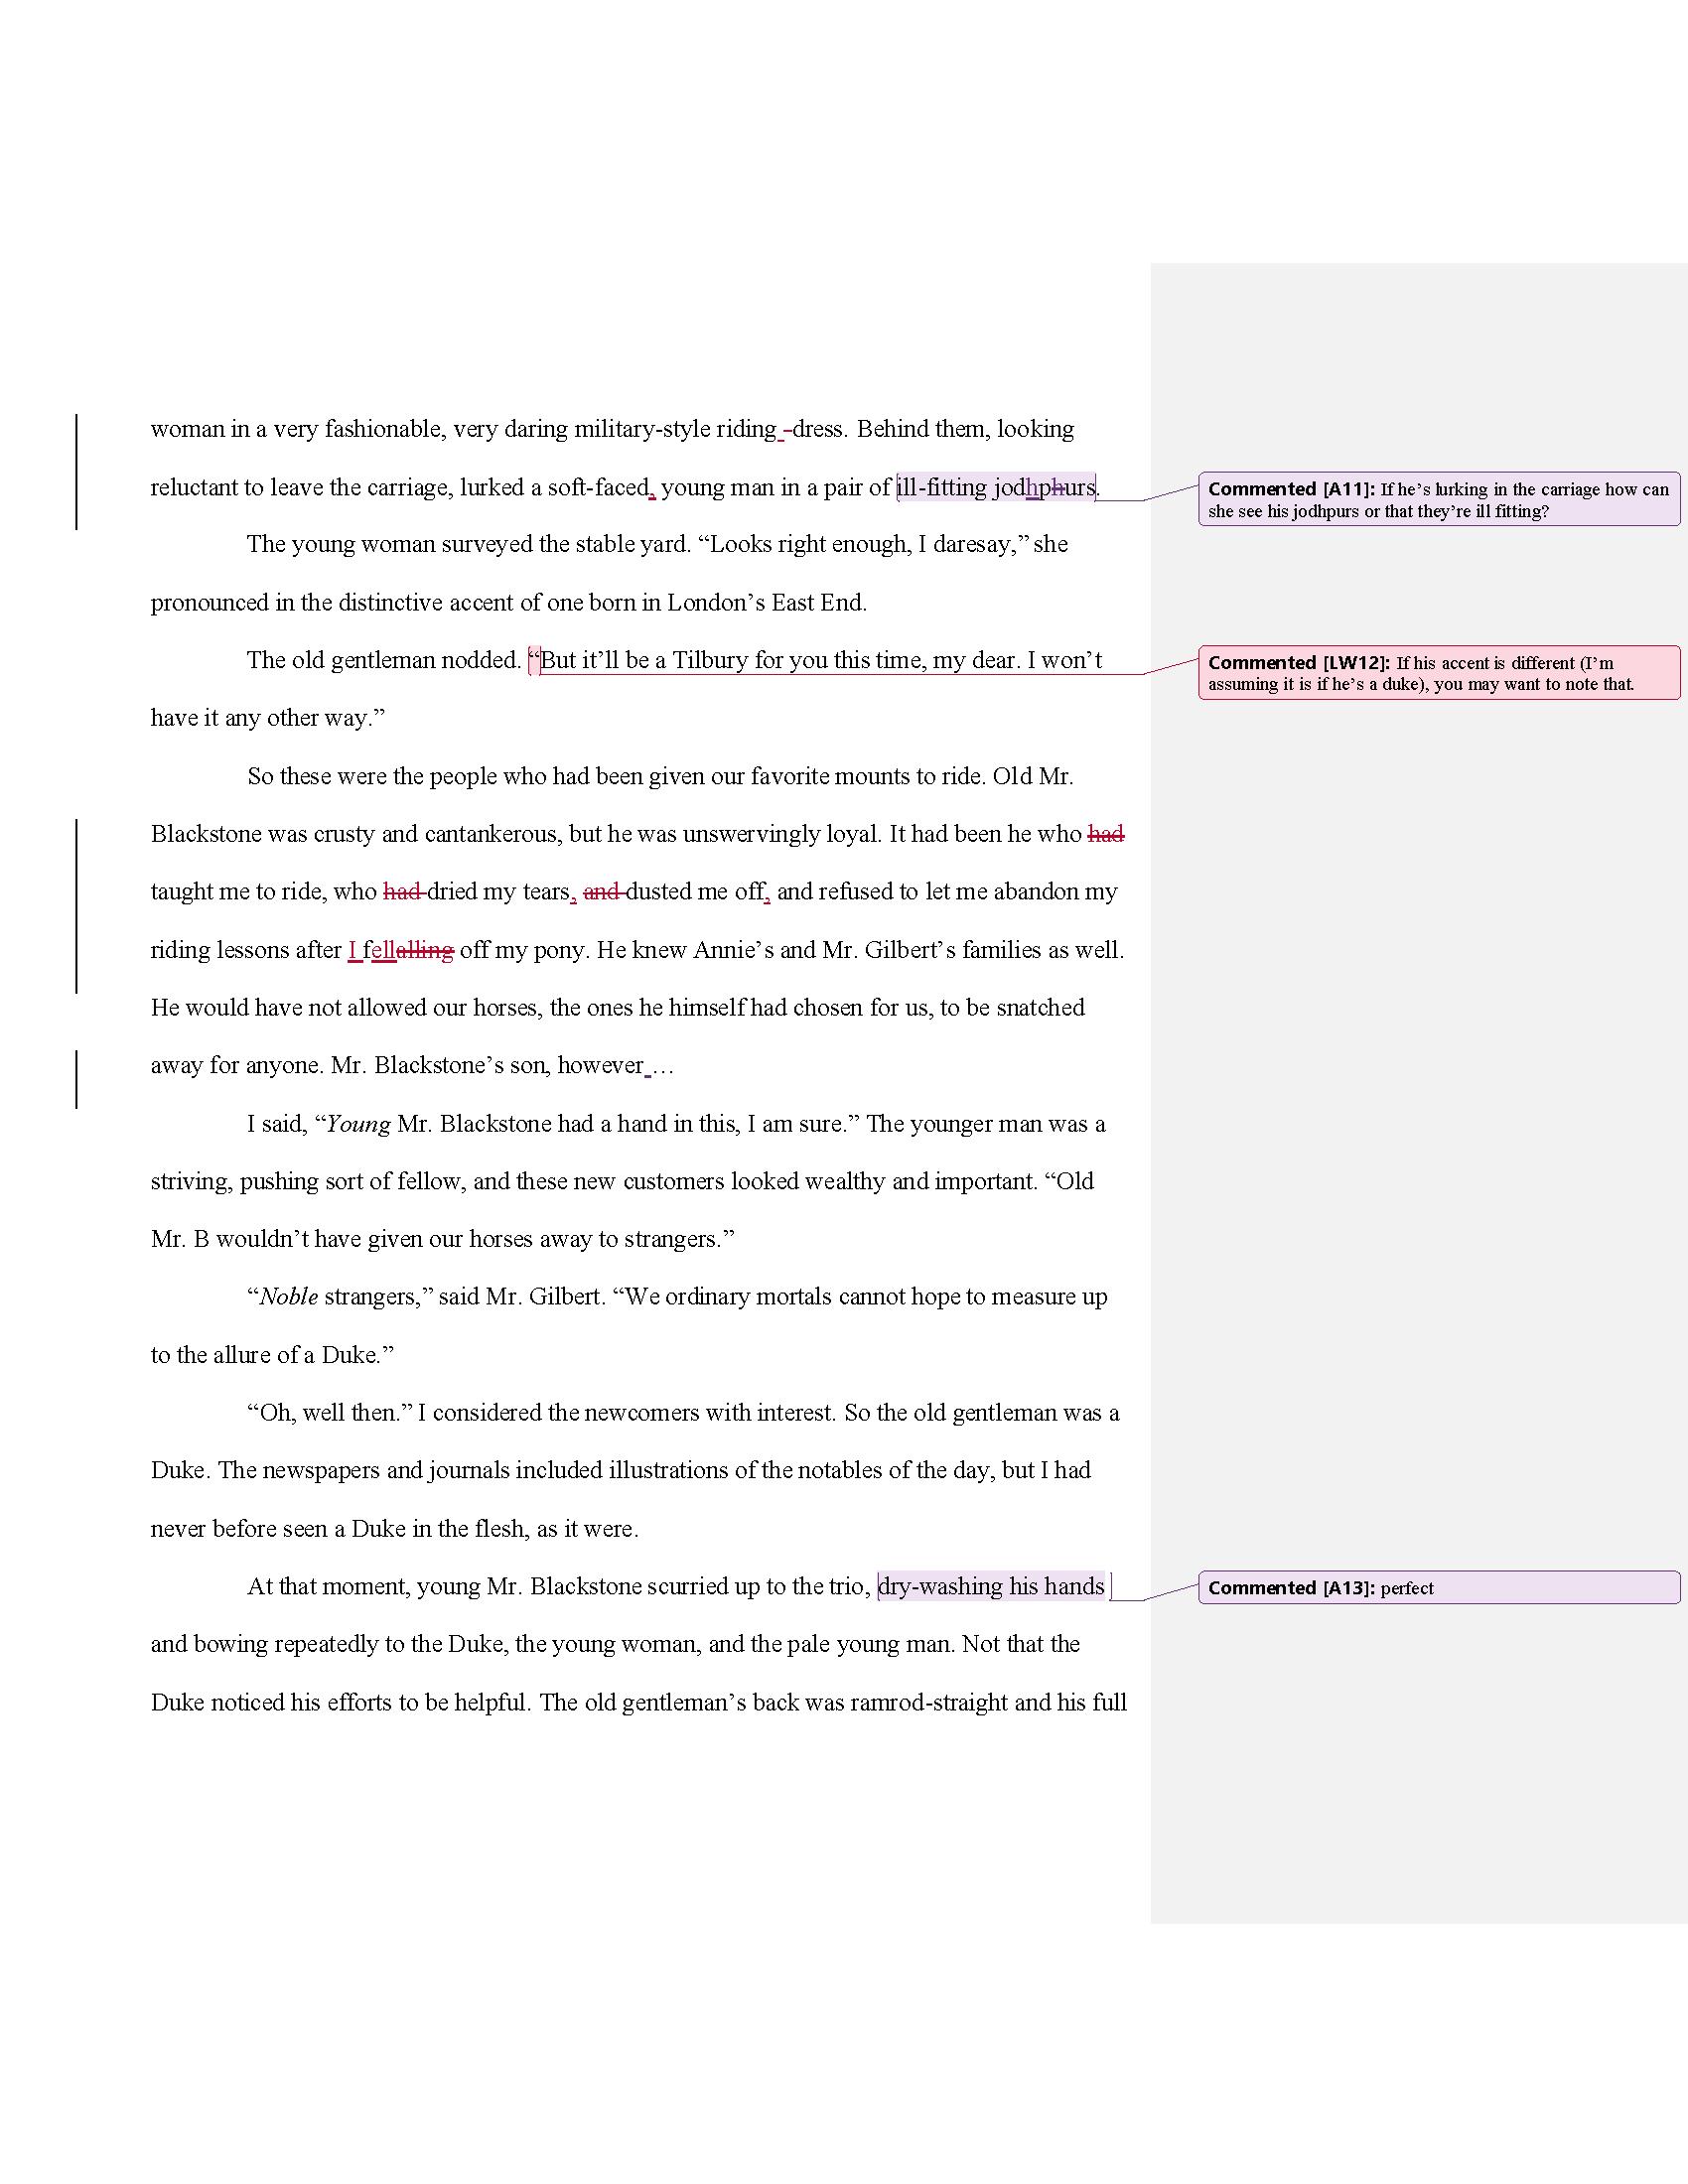 56-MysteryatBlackstoneStables-1_Page_4.png